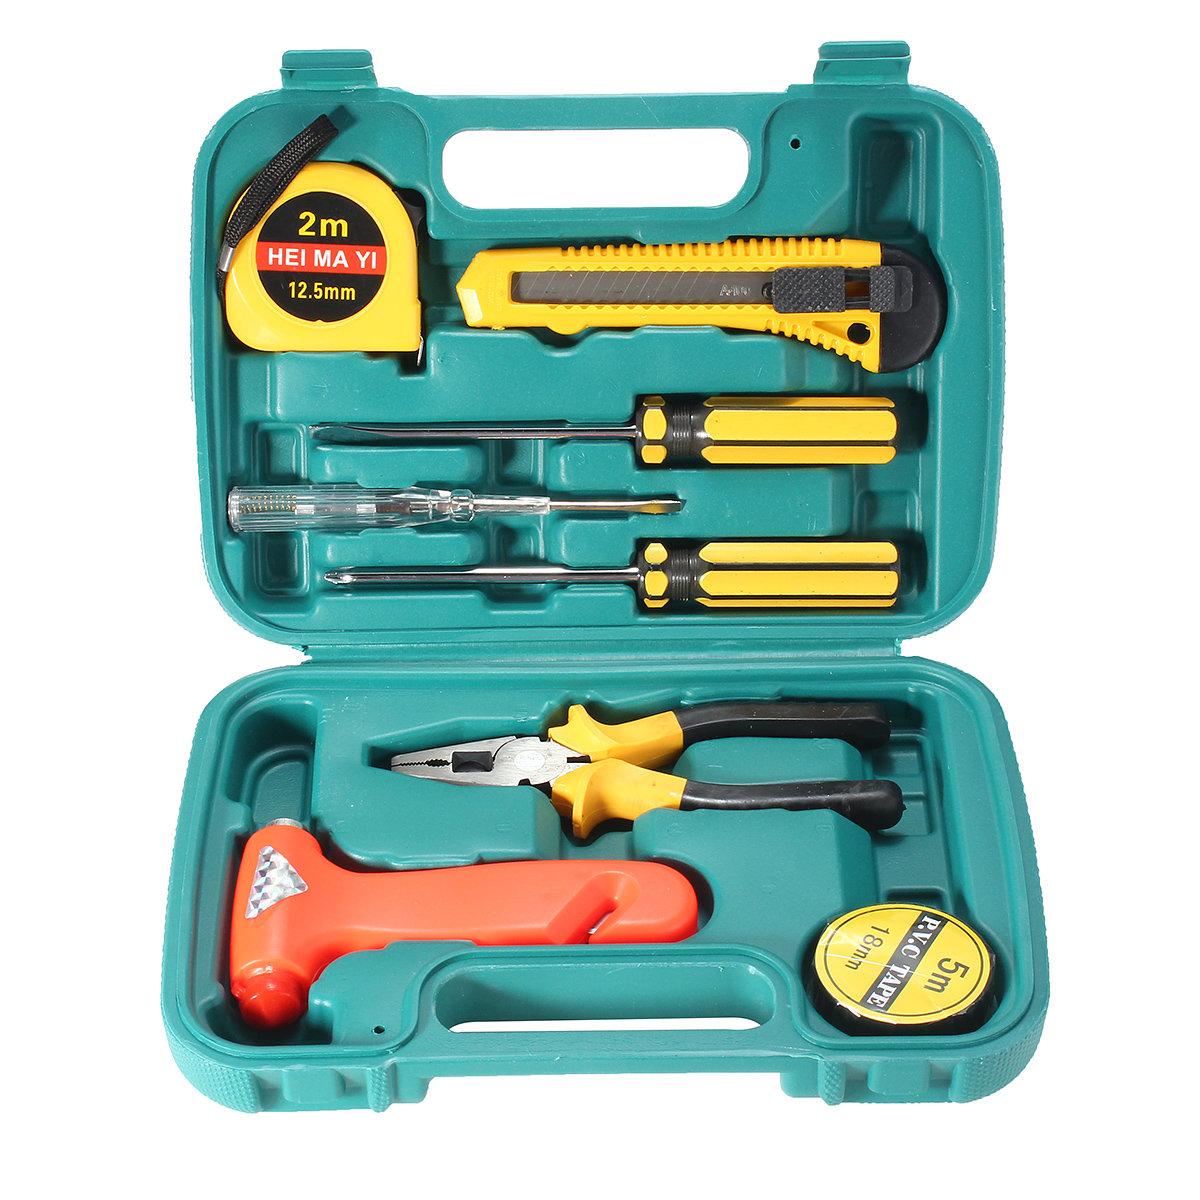 9Pcs Hardware Combination Kit Manual Tool Wrench Utility Knife Screwdriver Car Emergency Tool